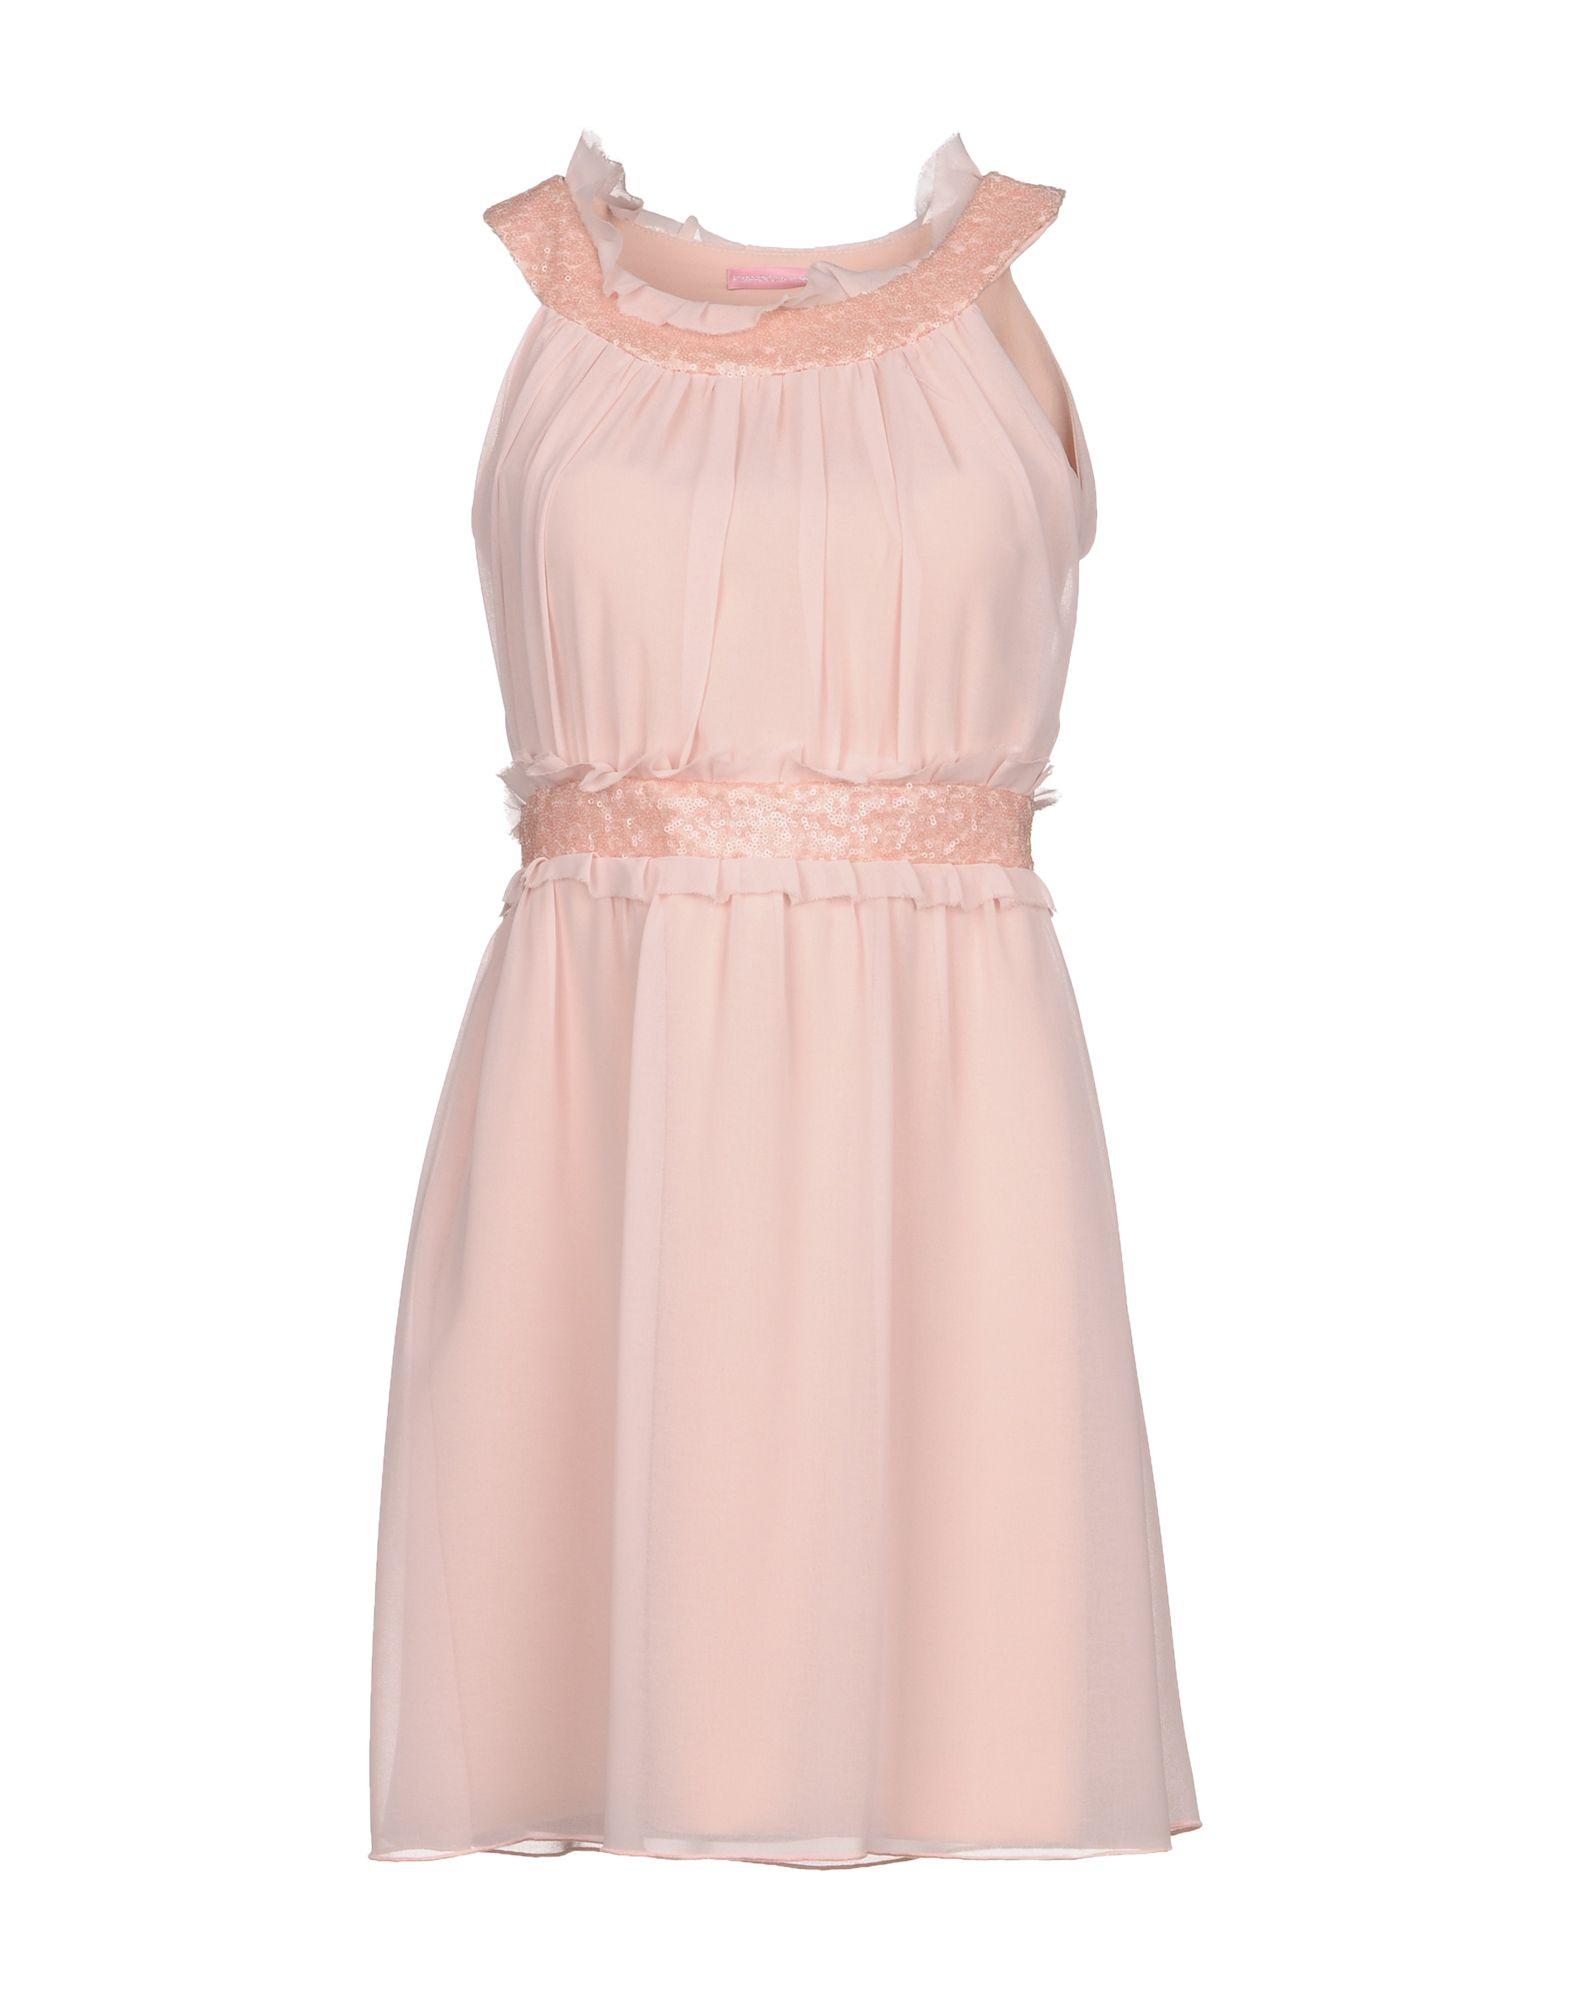 FRANCESCA FERRANTE Короткое платье платье francesca lucini платья и сарафаны в полоску